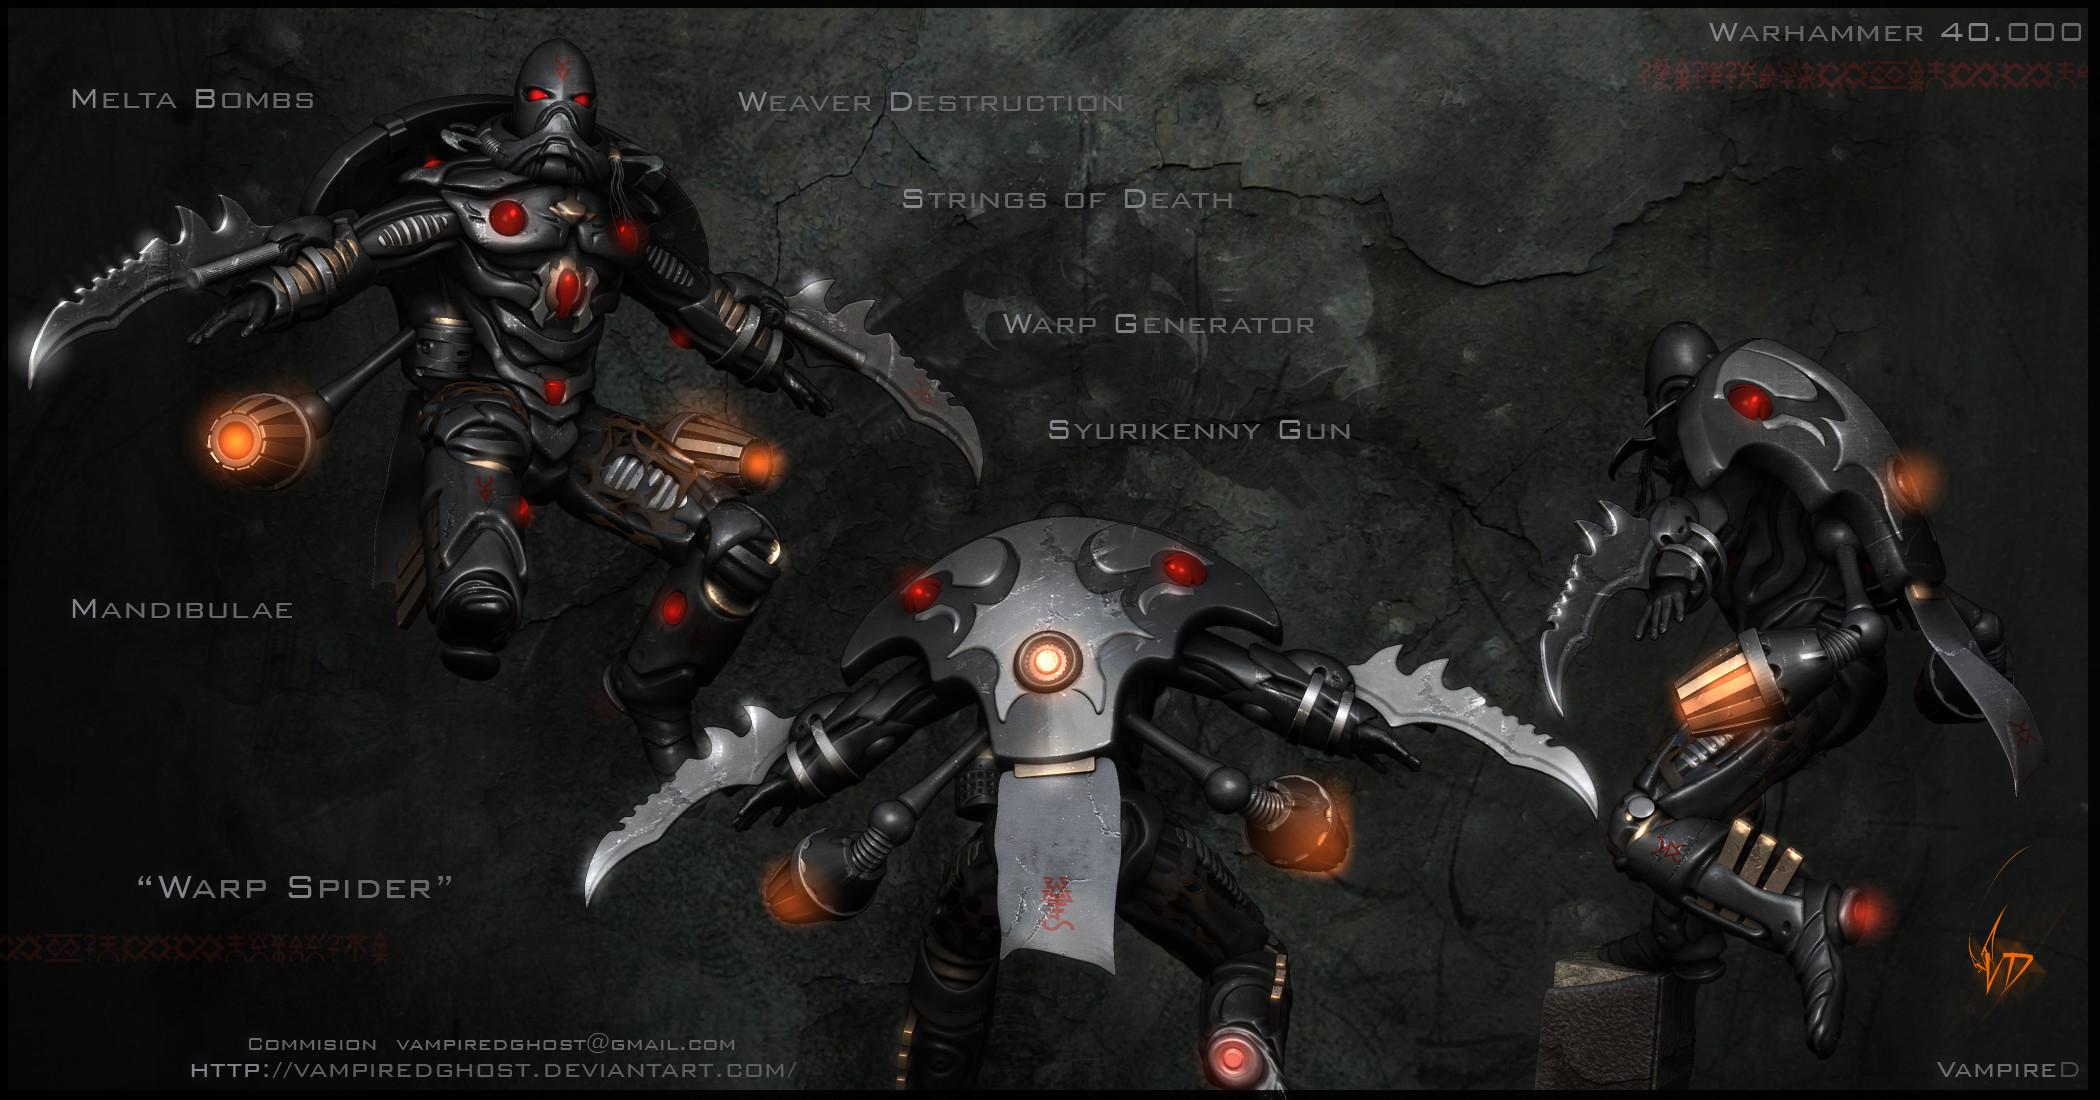 Warhammer 40k Eldar Wallpaper Com/groups/eldar-fan-group